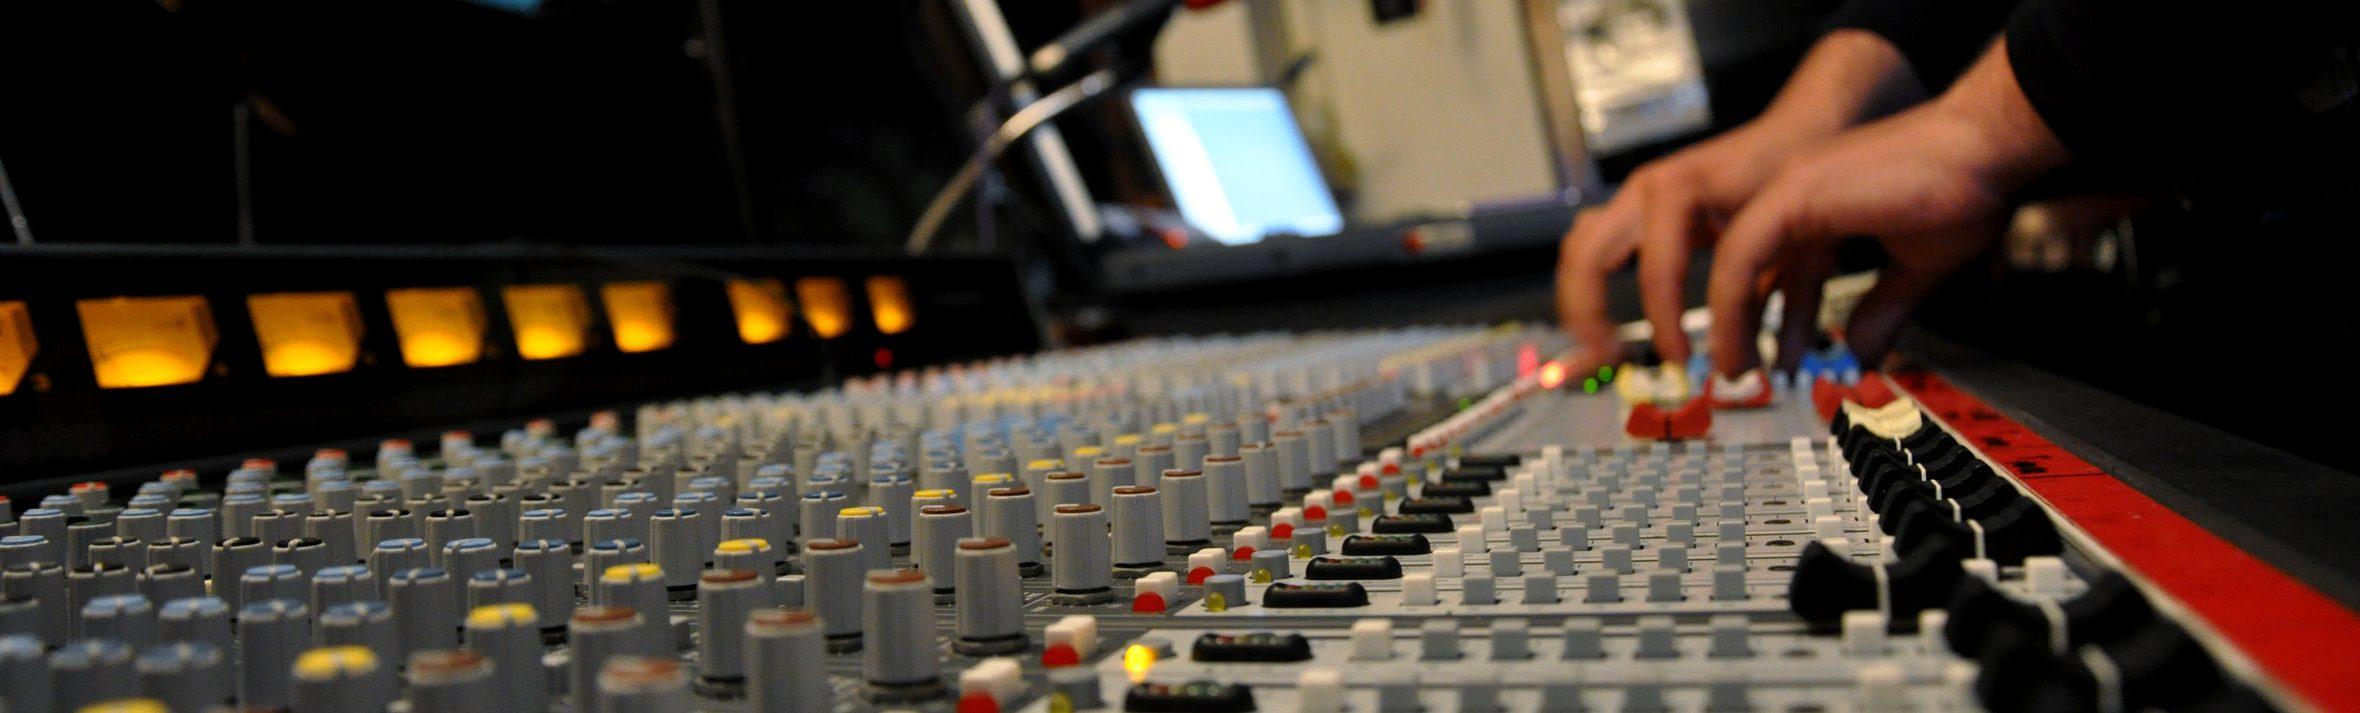 Tontechnik-Unterricht